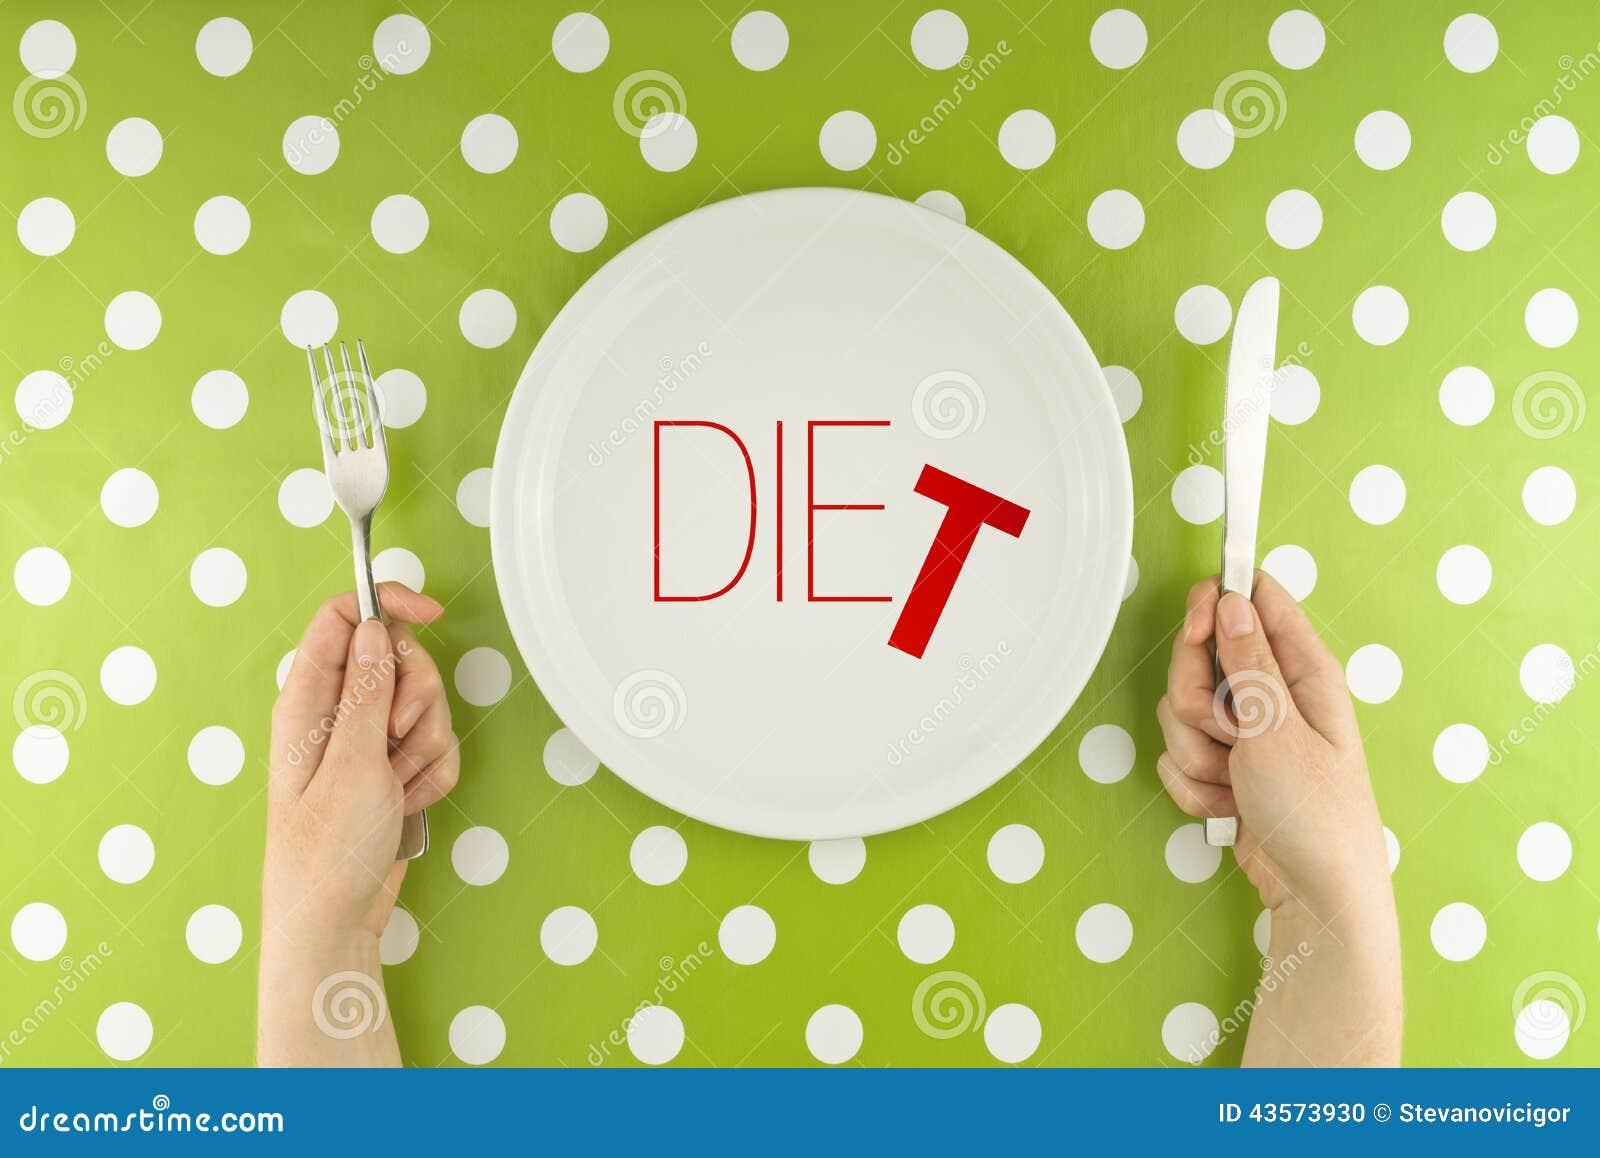 Ręka chwyta flatware nad dieting talerz